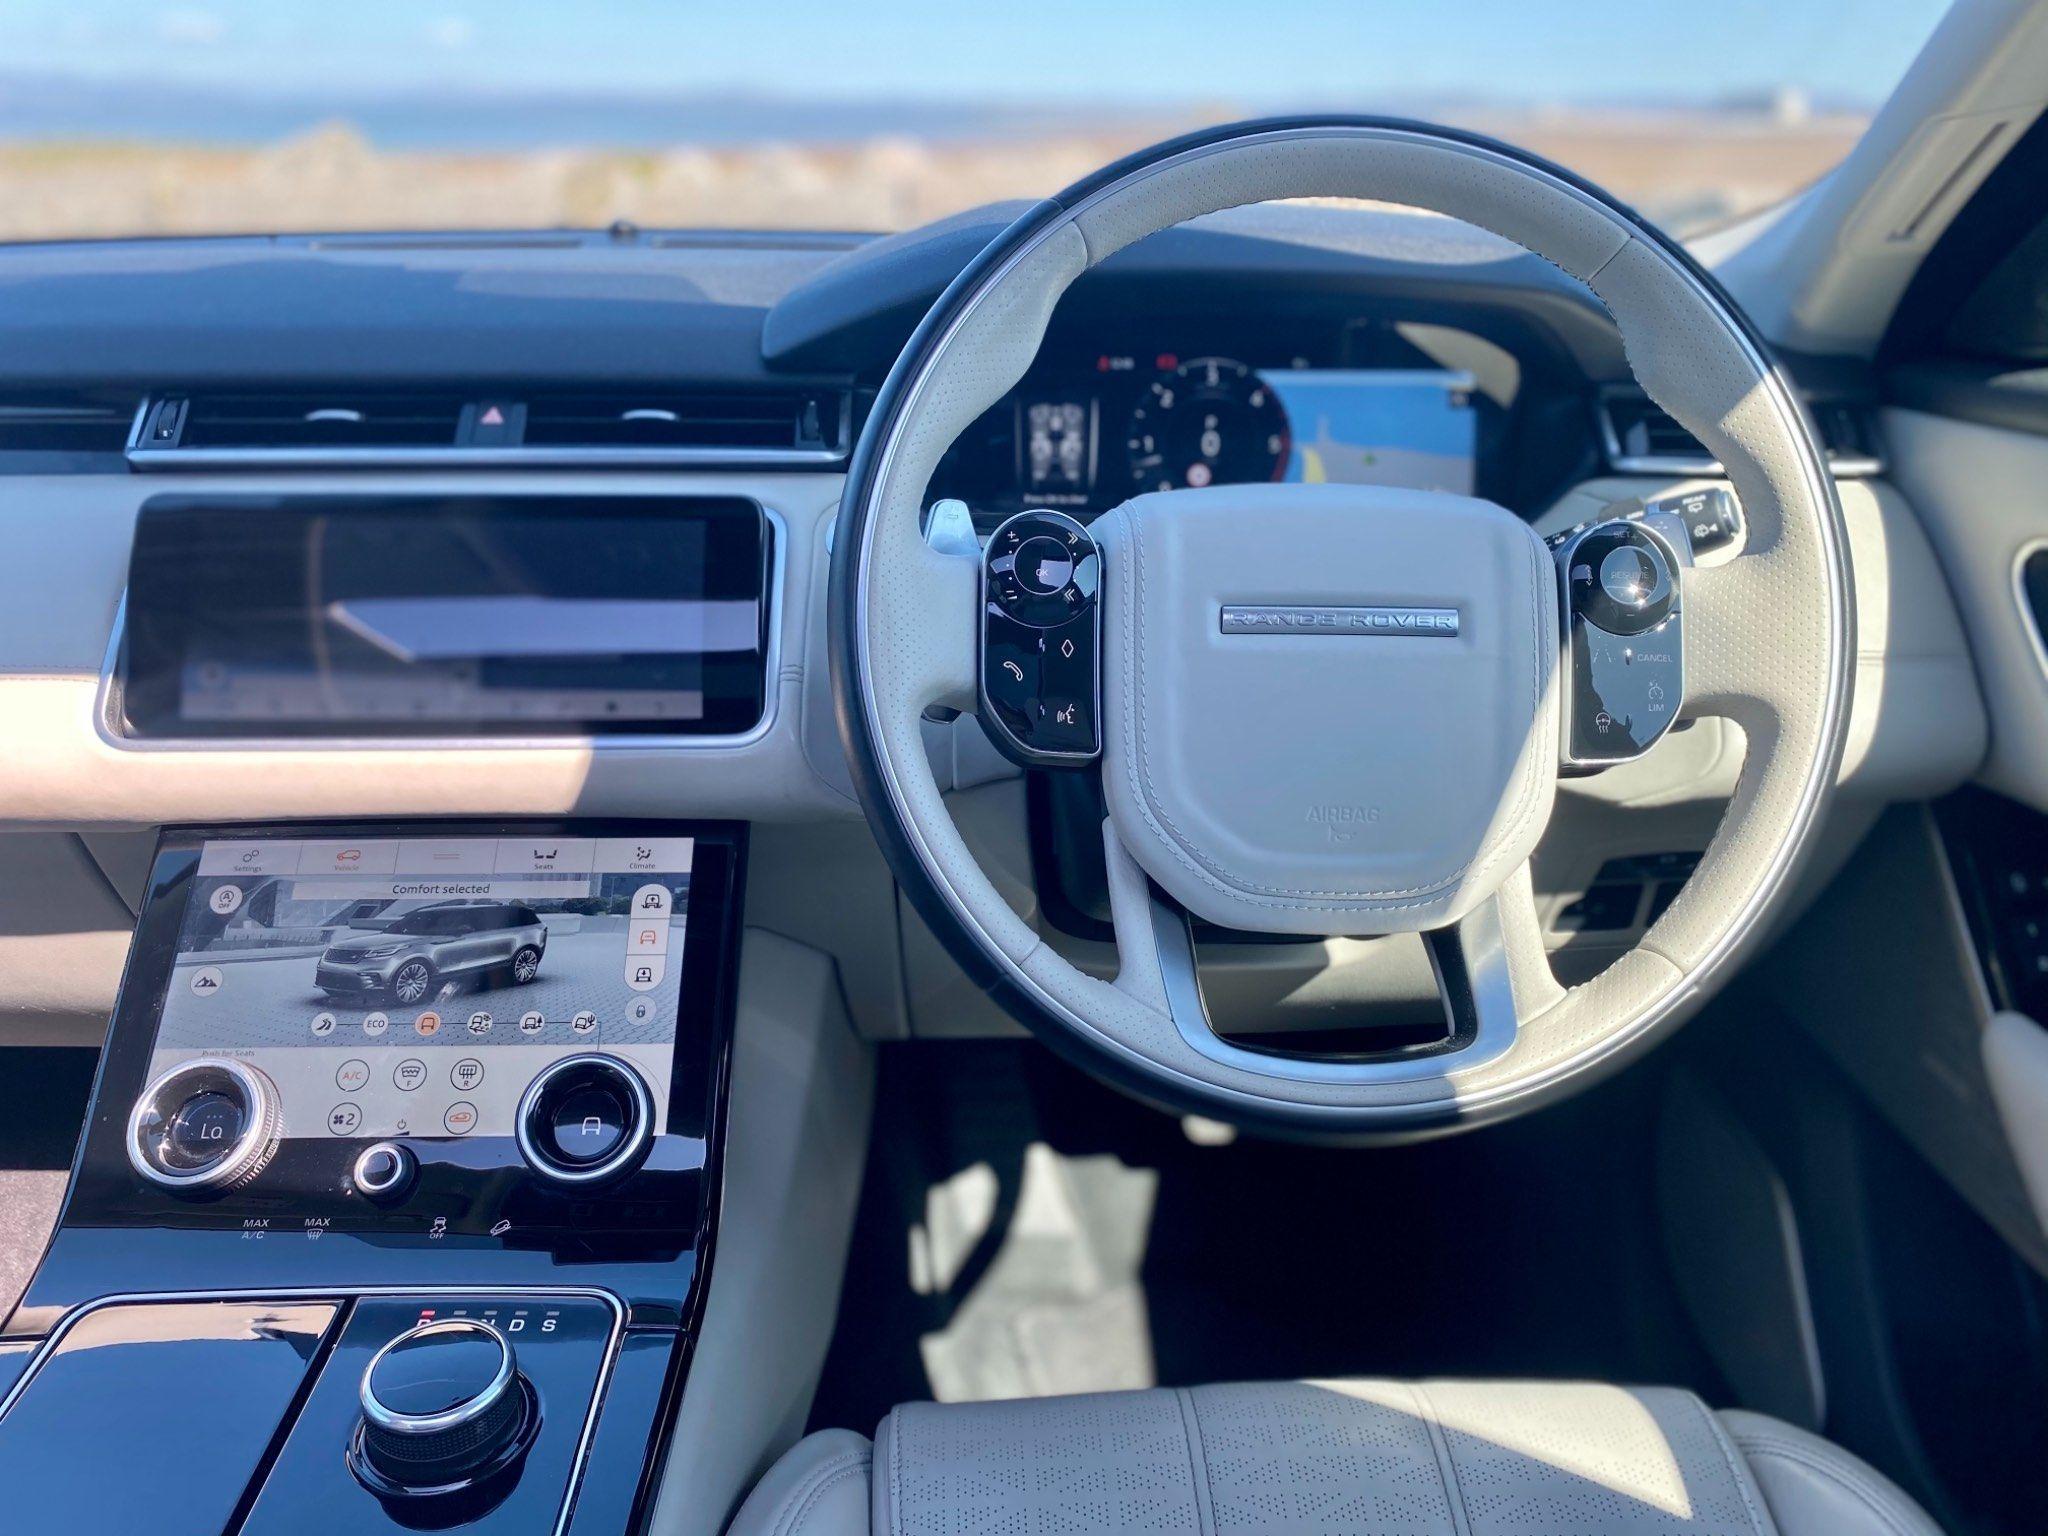 Land Rover Velar Images